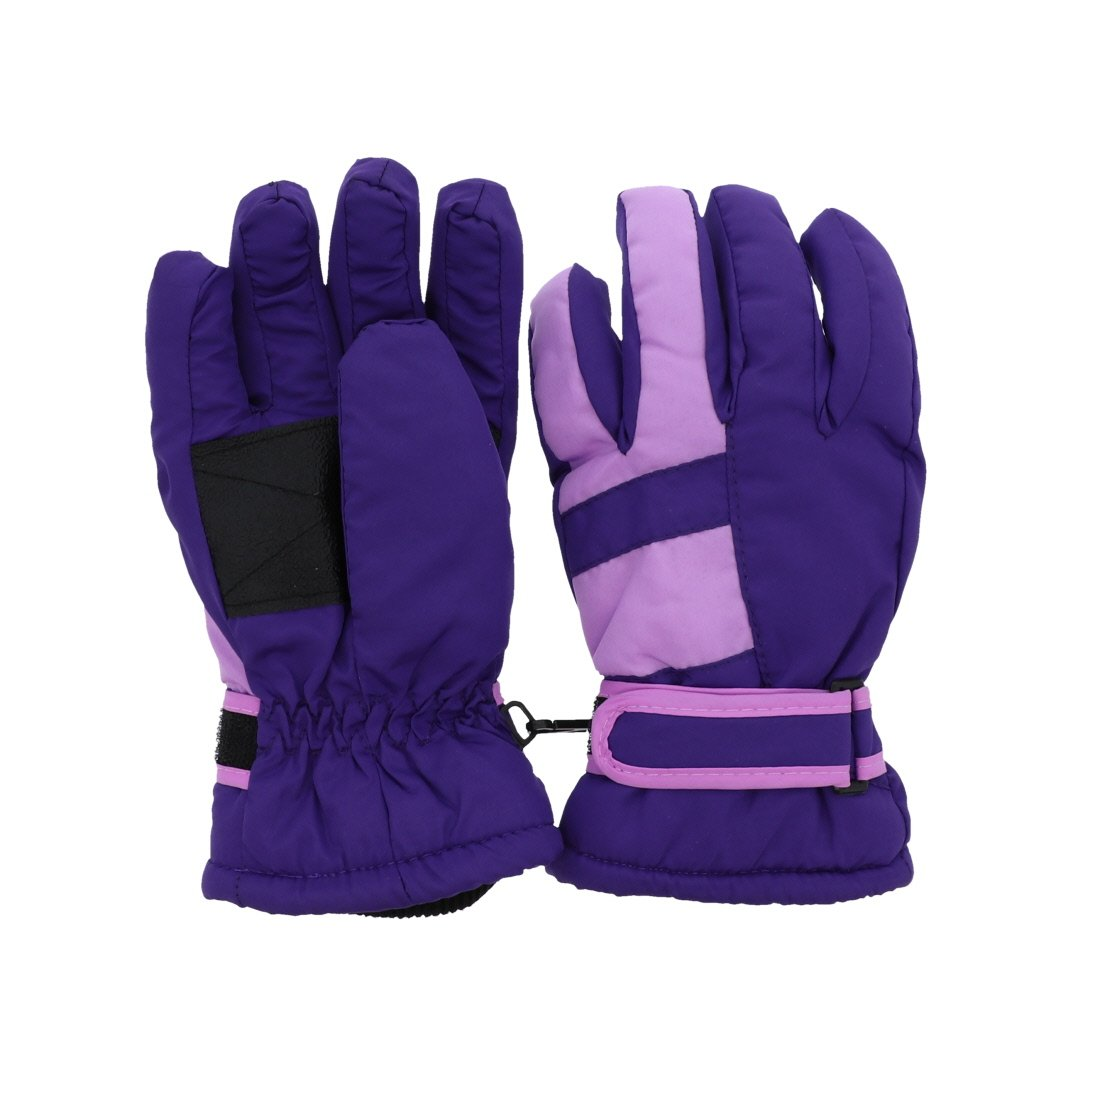 Waterproof Stripe Ski Gloves for Youth - Purple MTGL0052PU